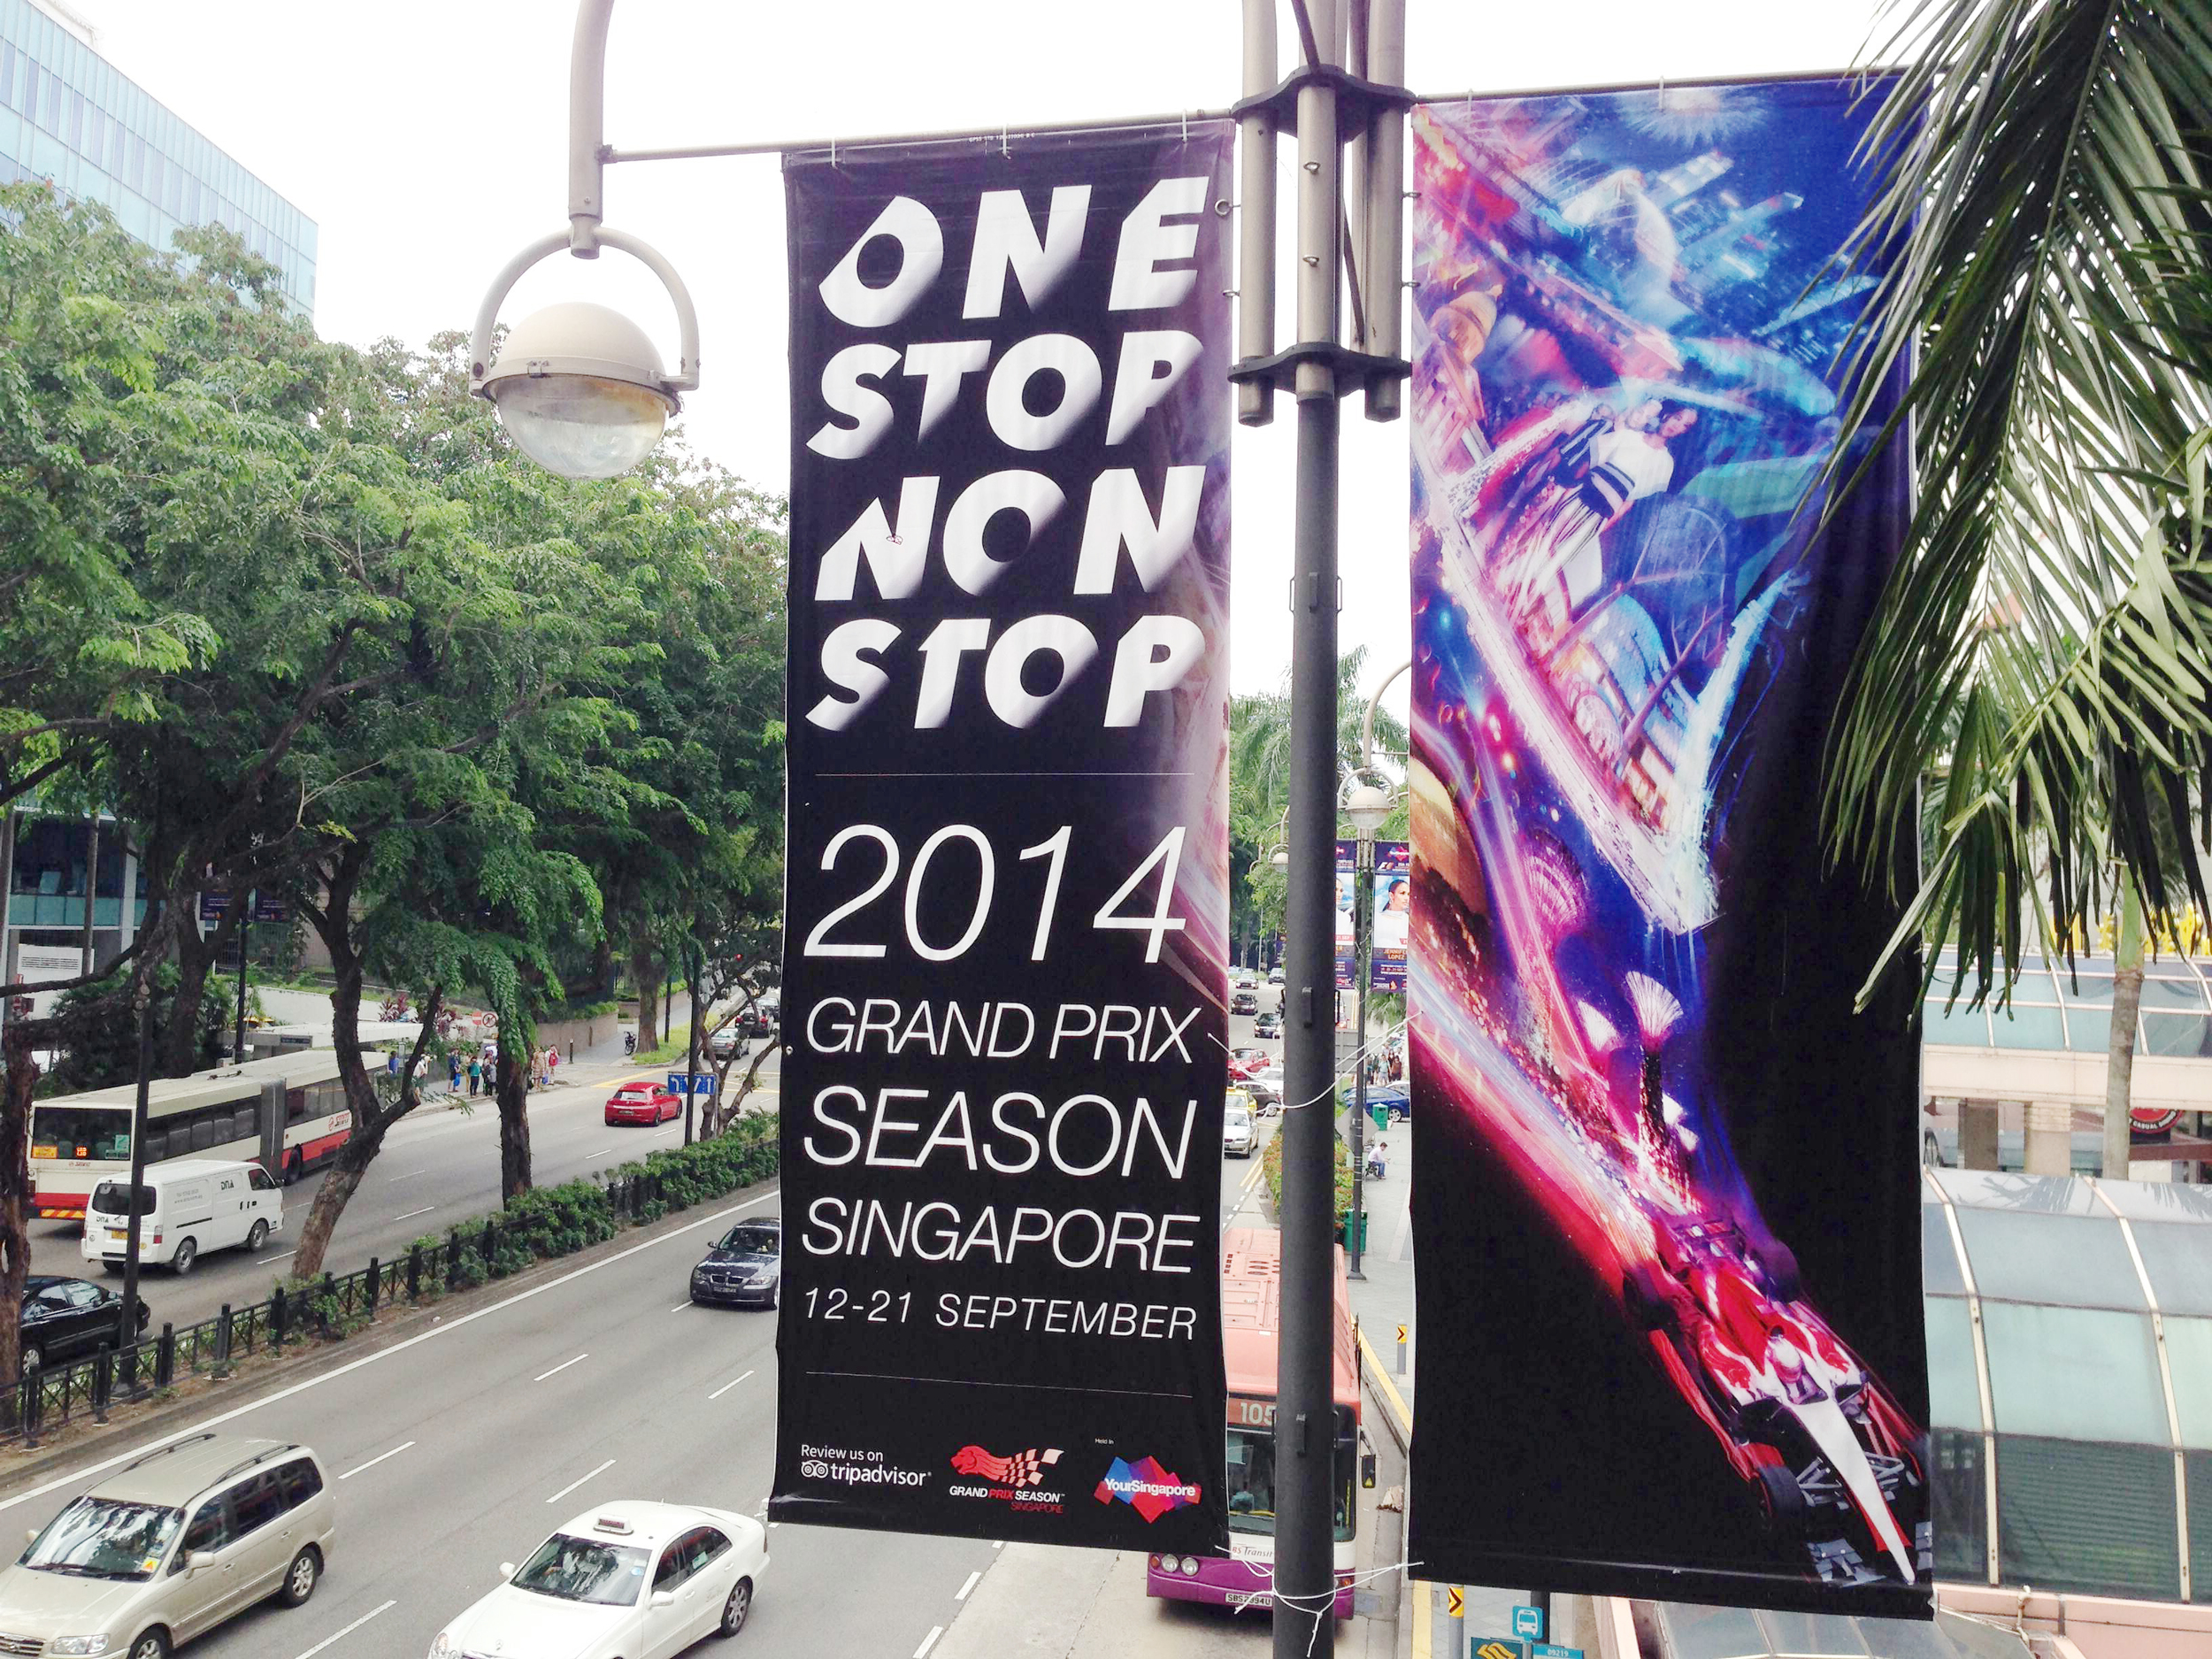 outeredit - f1 grand prix season singapore - banner 2